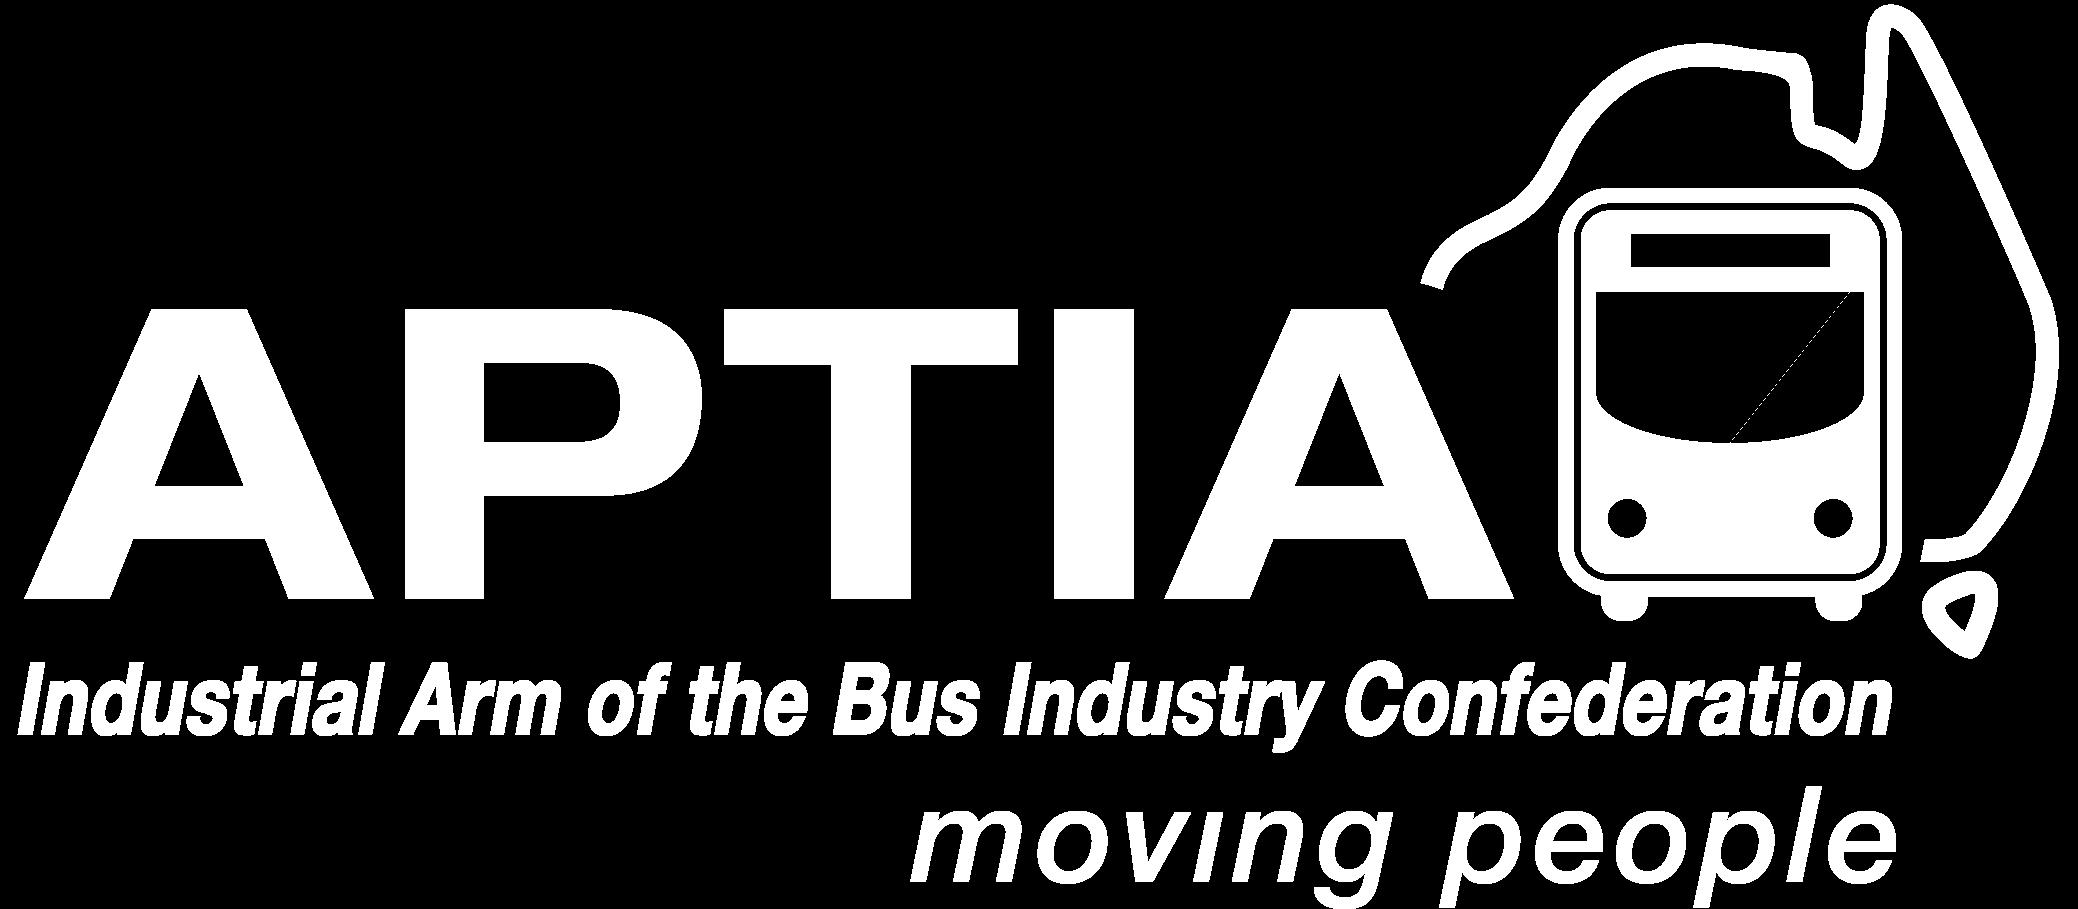 Australian Public Transport Industrial Association